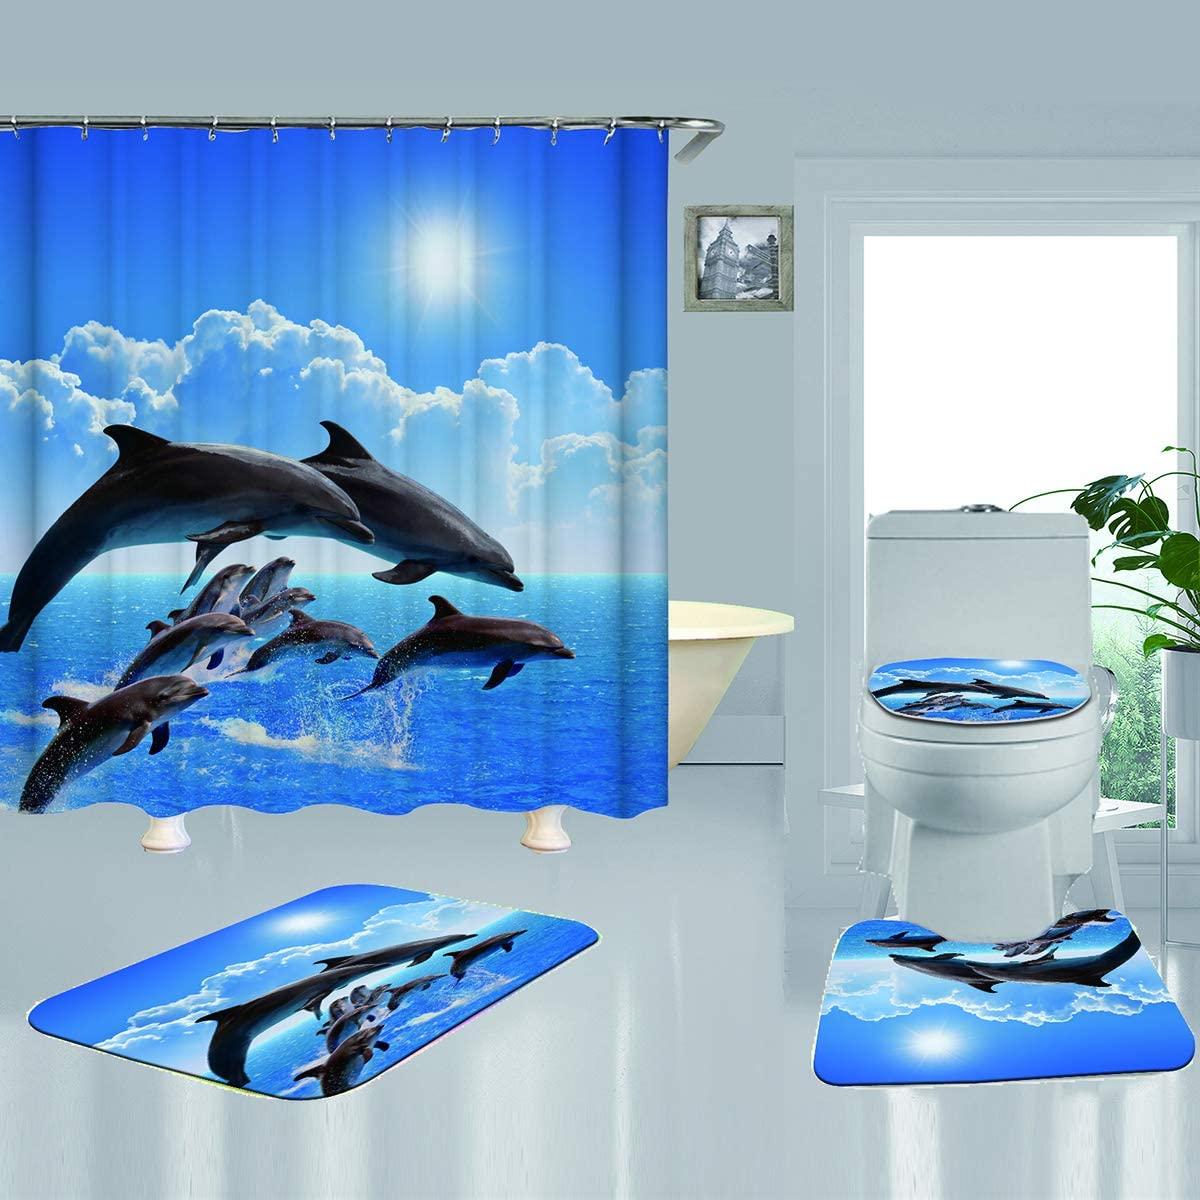 SH-RuiDu 4pcs/Set Ocean Print Non Slip Toilet Lid Cover Bath Mat Set Waterproof Shower Curtain with 12 Hooks for Home Bathroom